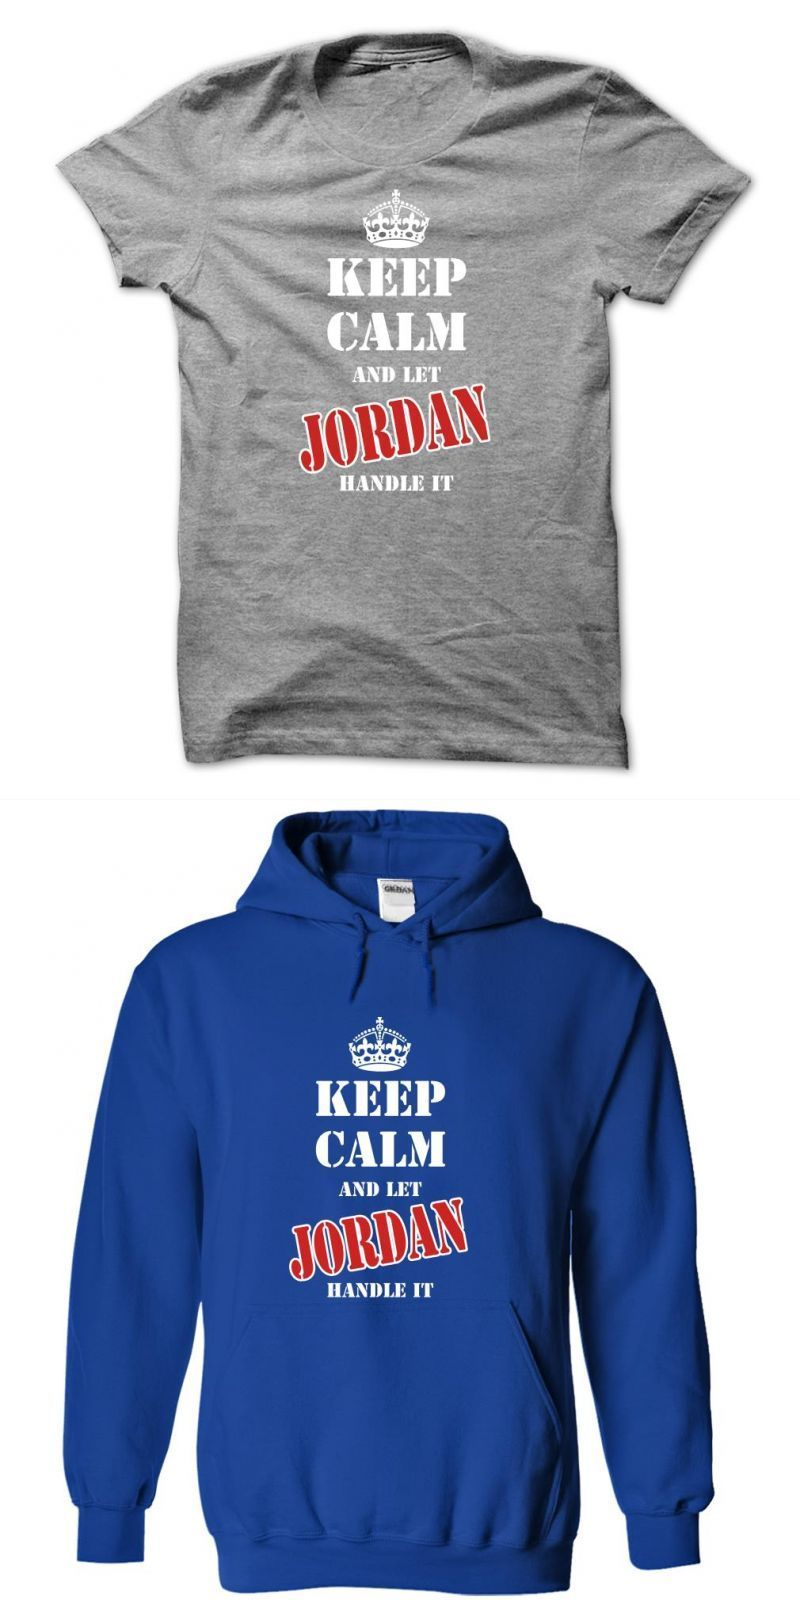 0866c3f91778 Long Sleeve Jordan T Shirts – Rockwall Auction